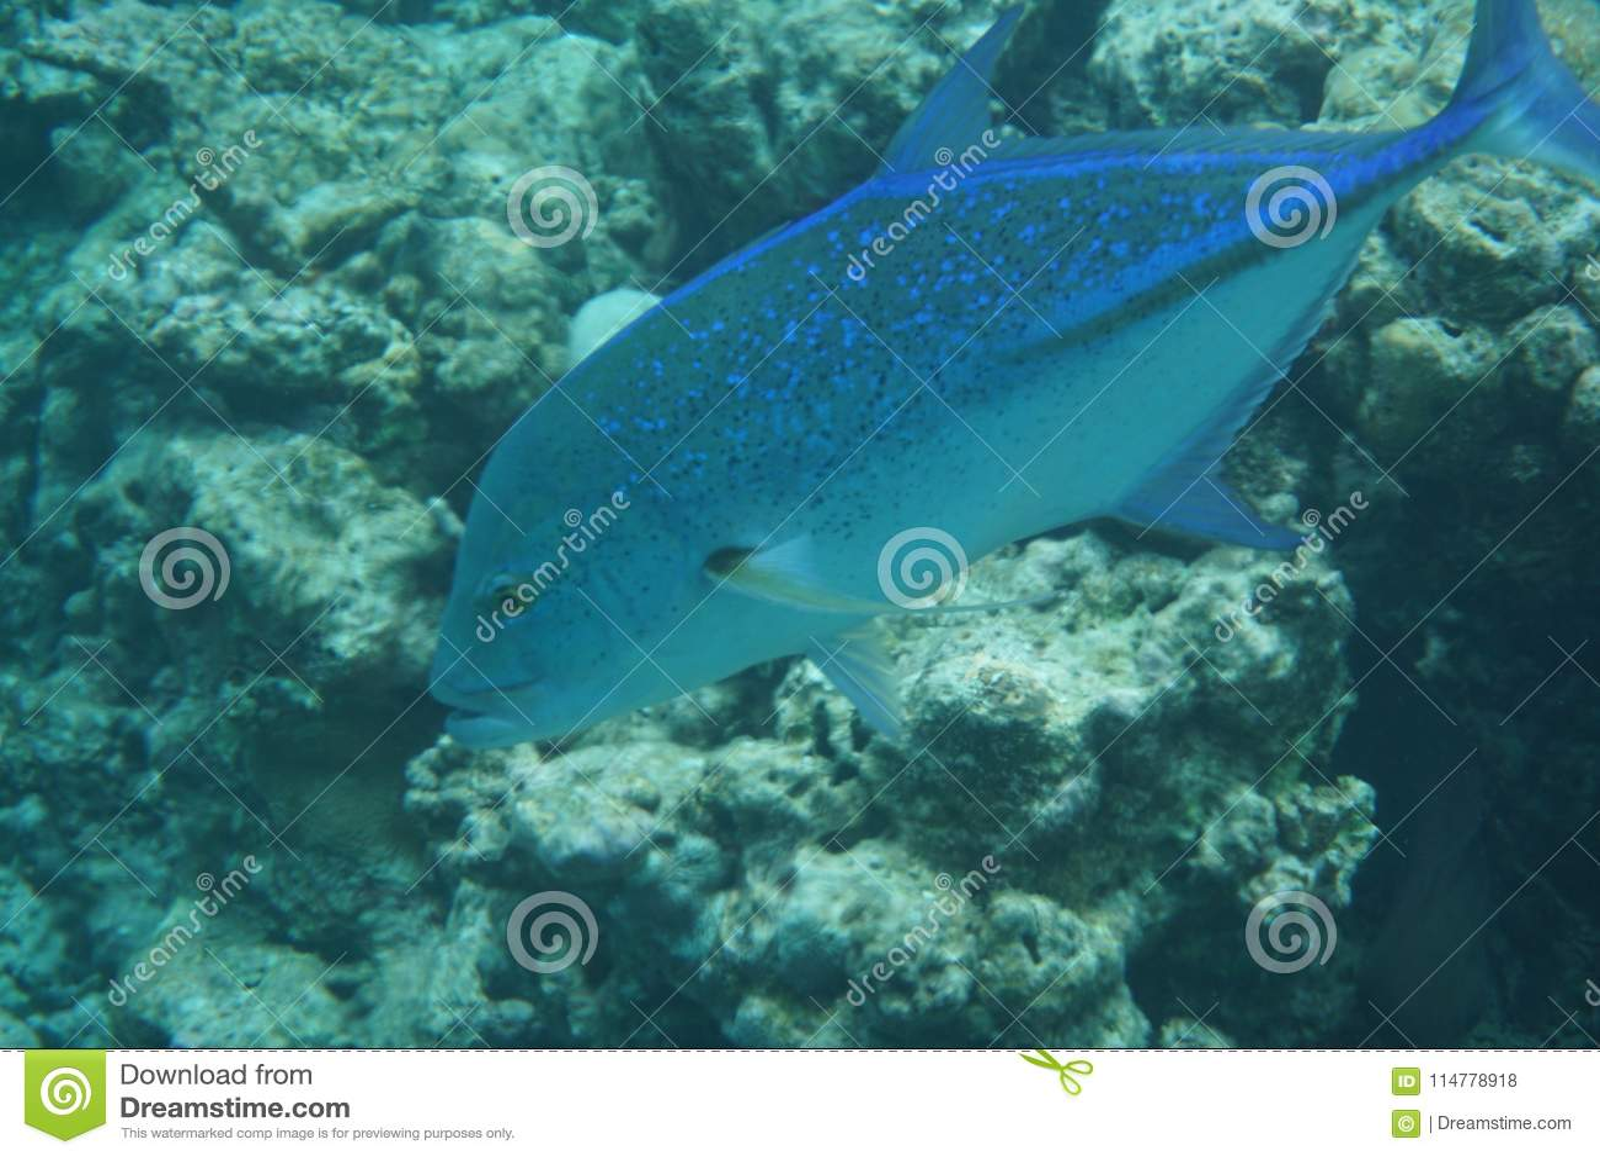 Bluefin trevally Caranx melampygus